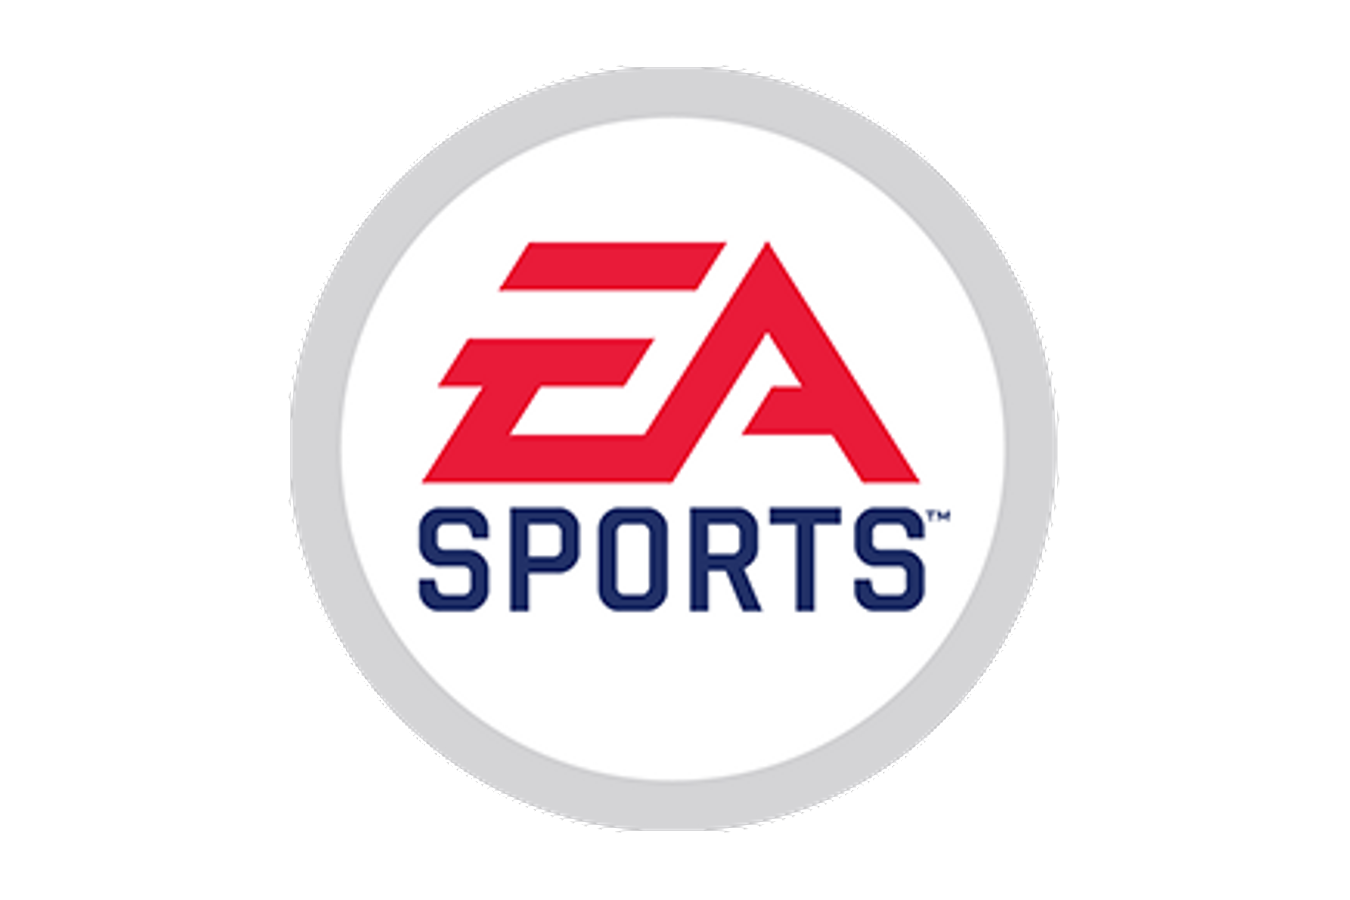 EA_Sports_new20